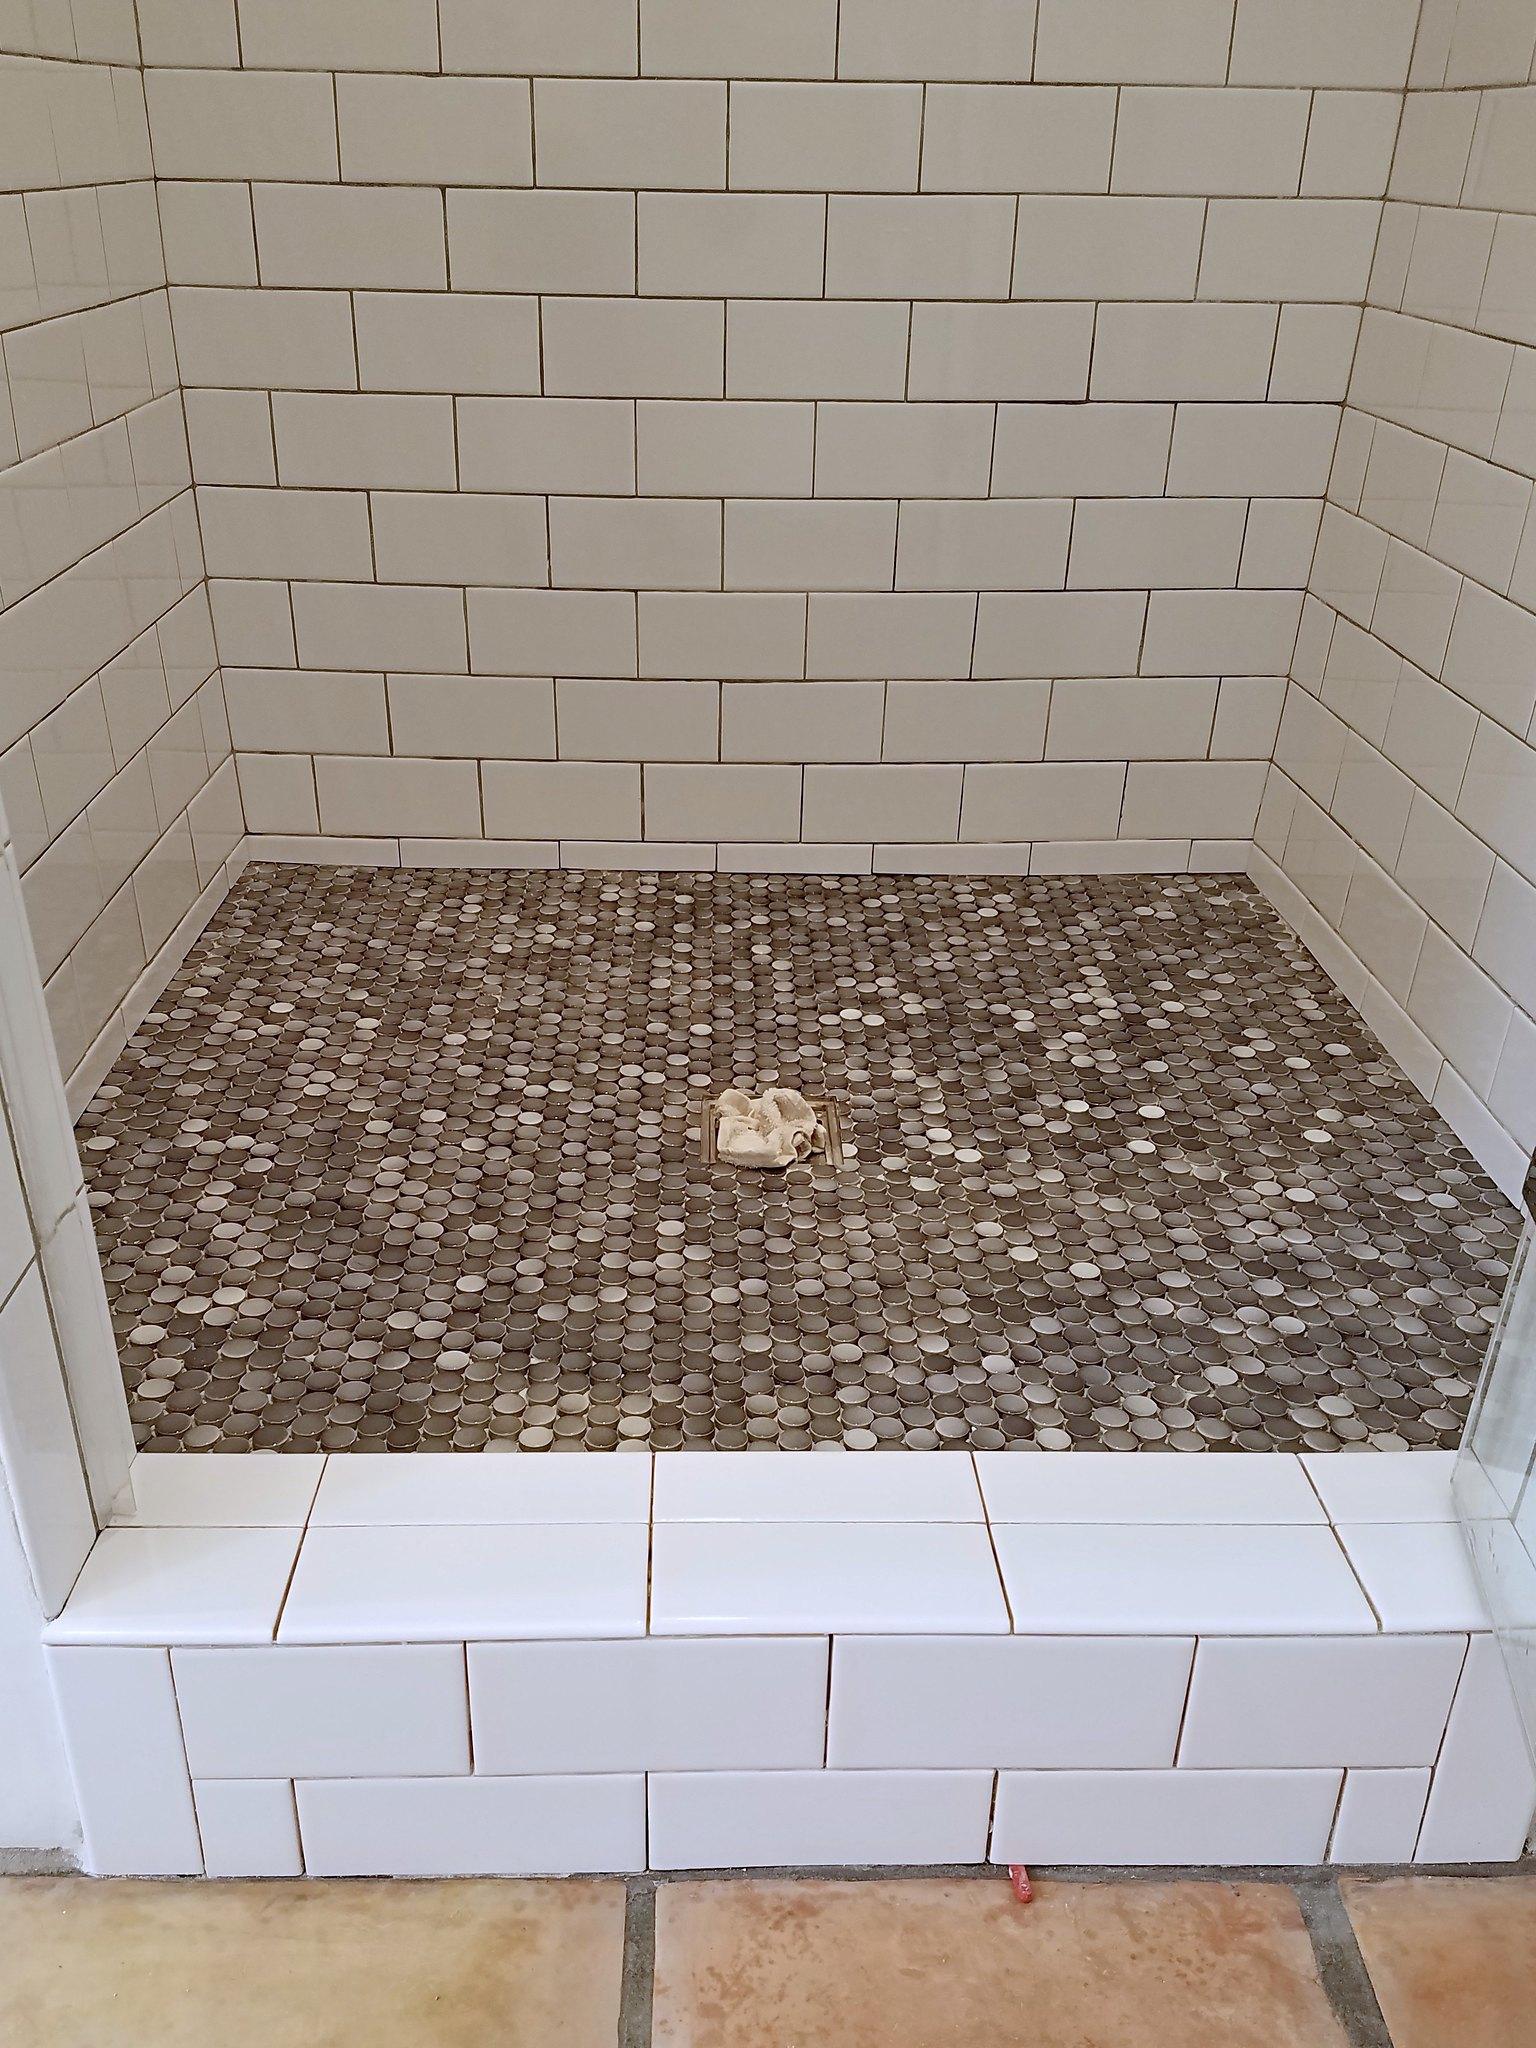 penny tiles